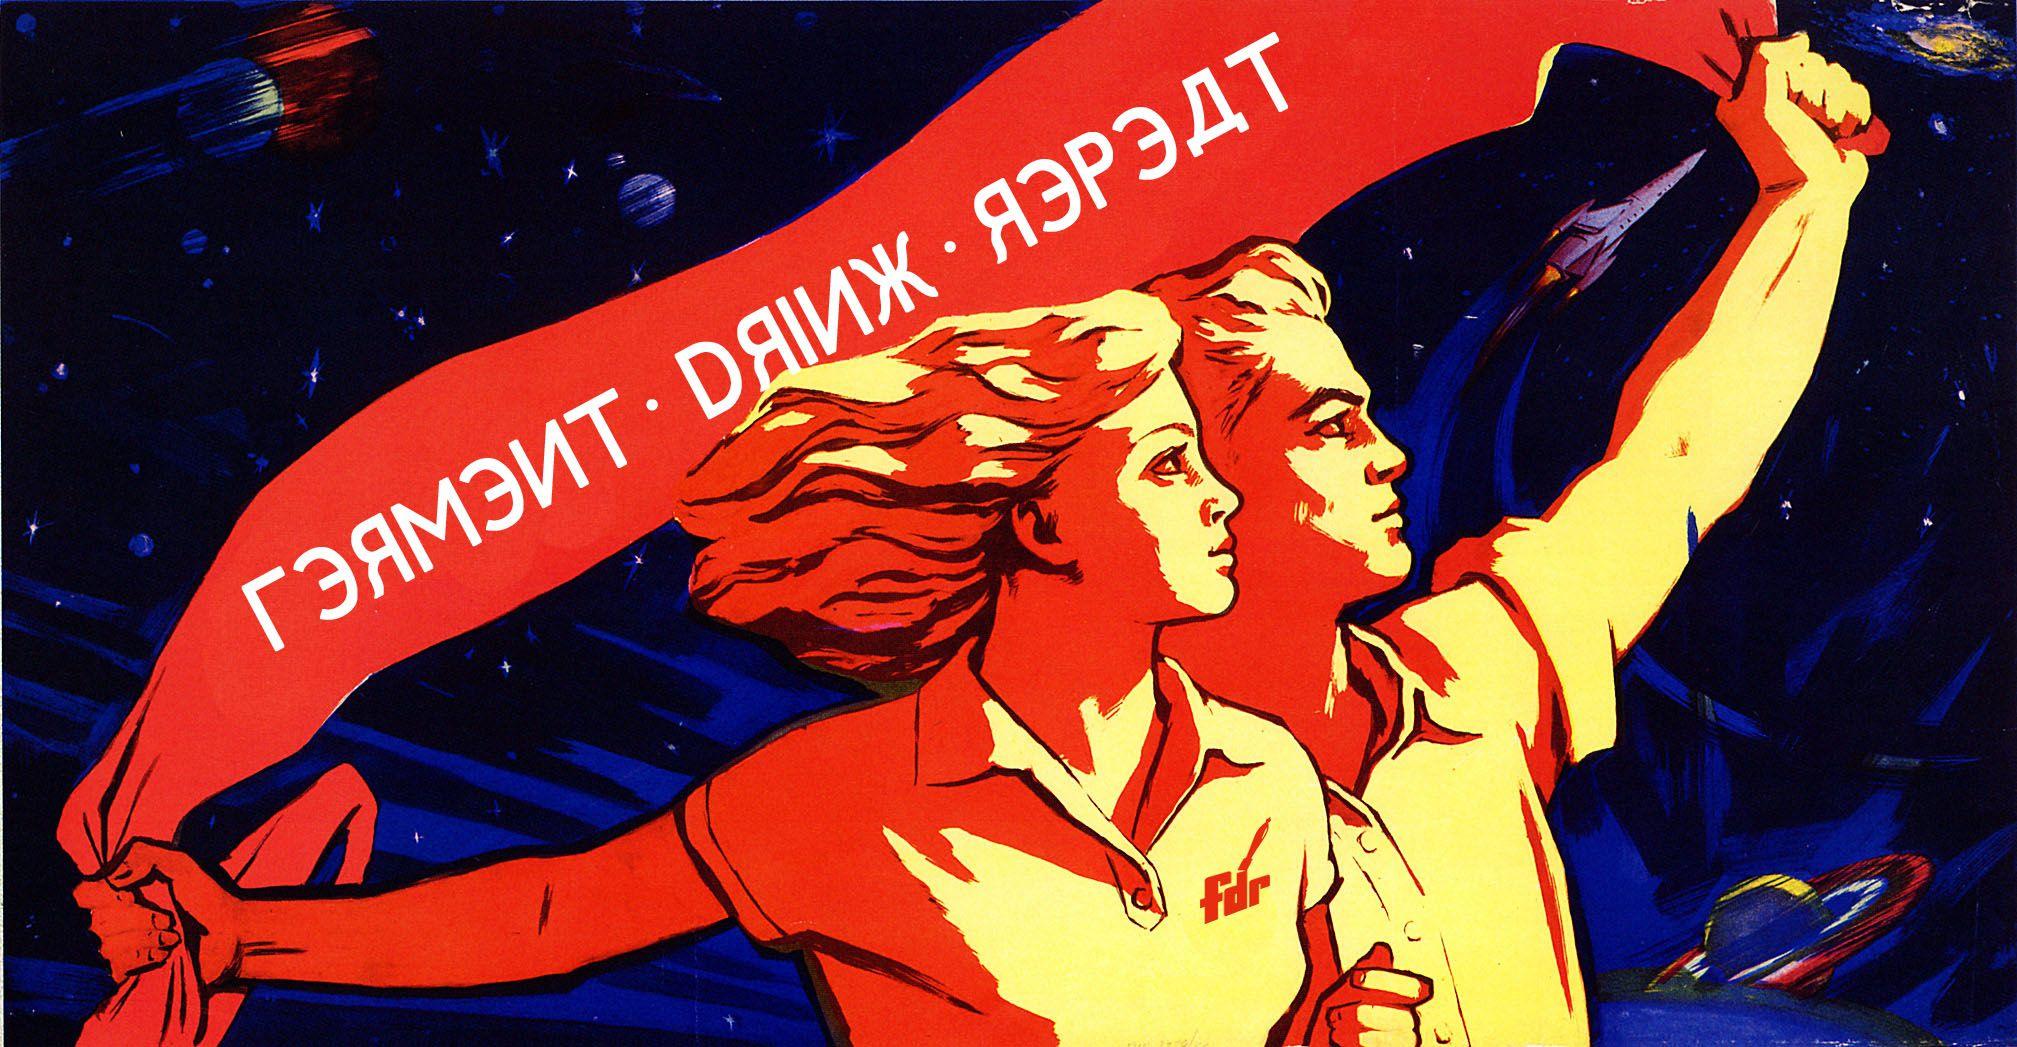 fdr propaganda banner